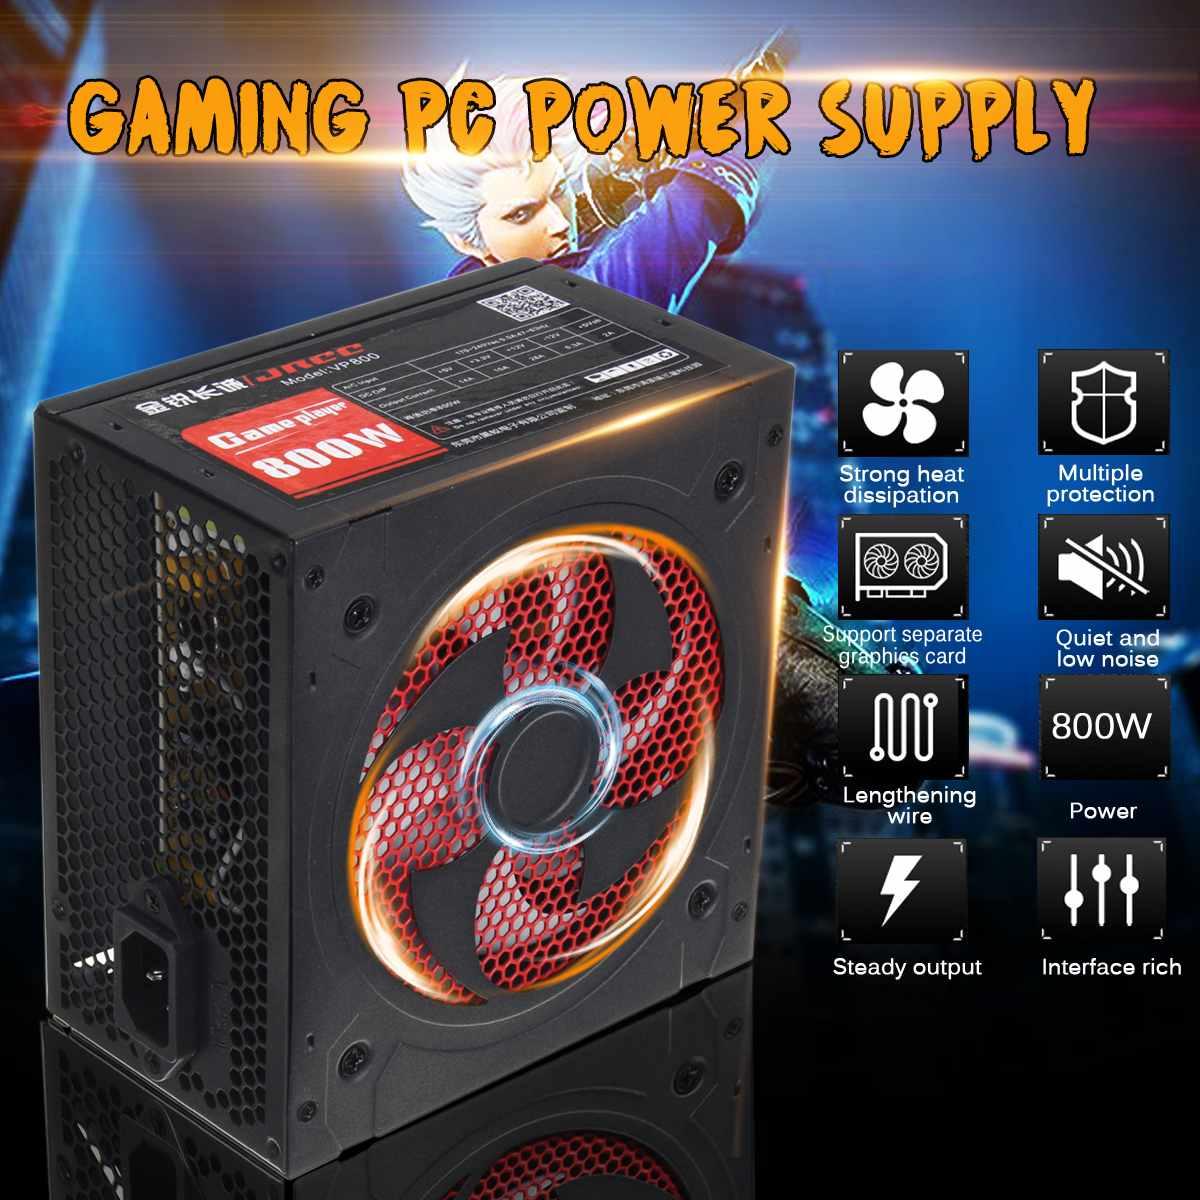 800W Gaming PC Power Supply PFC Silent Fan ATX 20+4pin 12V PC Computer SATA Gaming PC Power Supply Eu For Full Platform